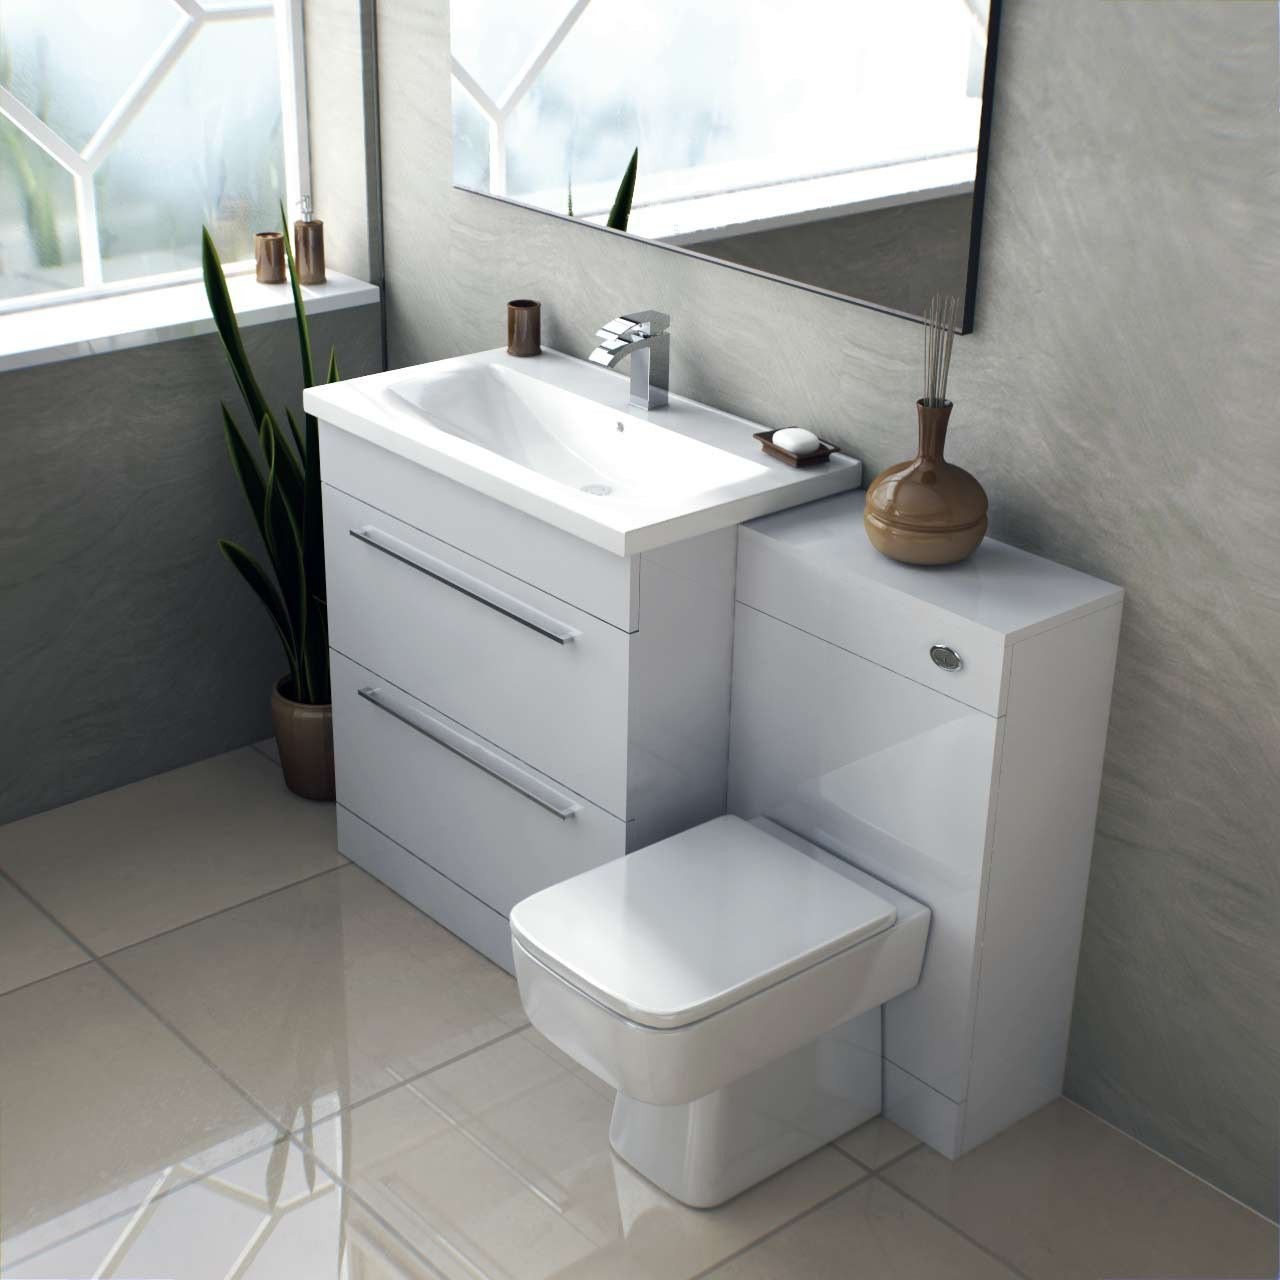 Napoli White Gloss 1300mm 2 Drawer Vanity Unit Toilet Suite